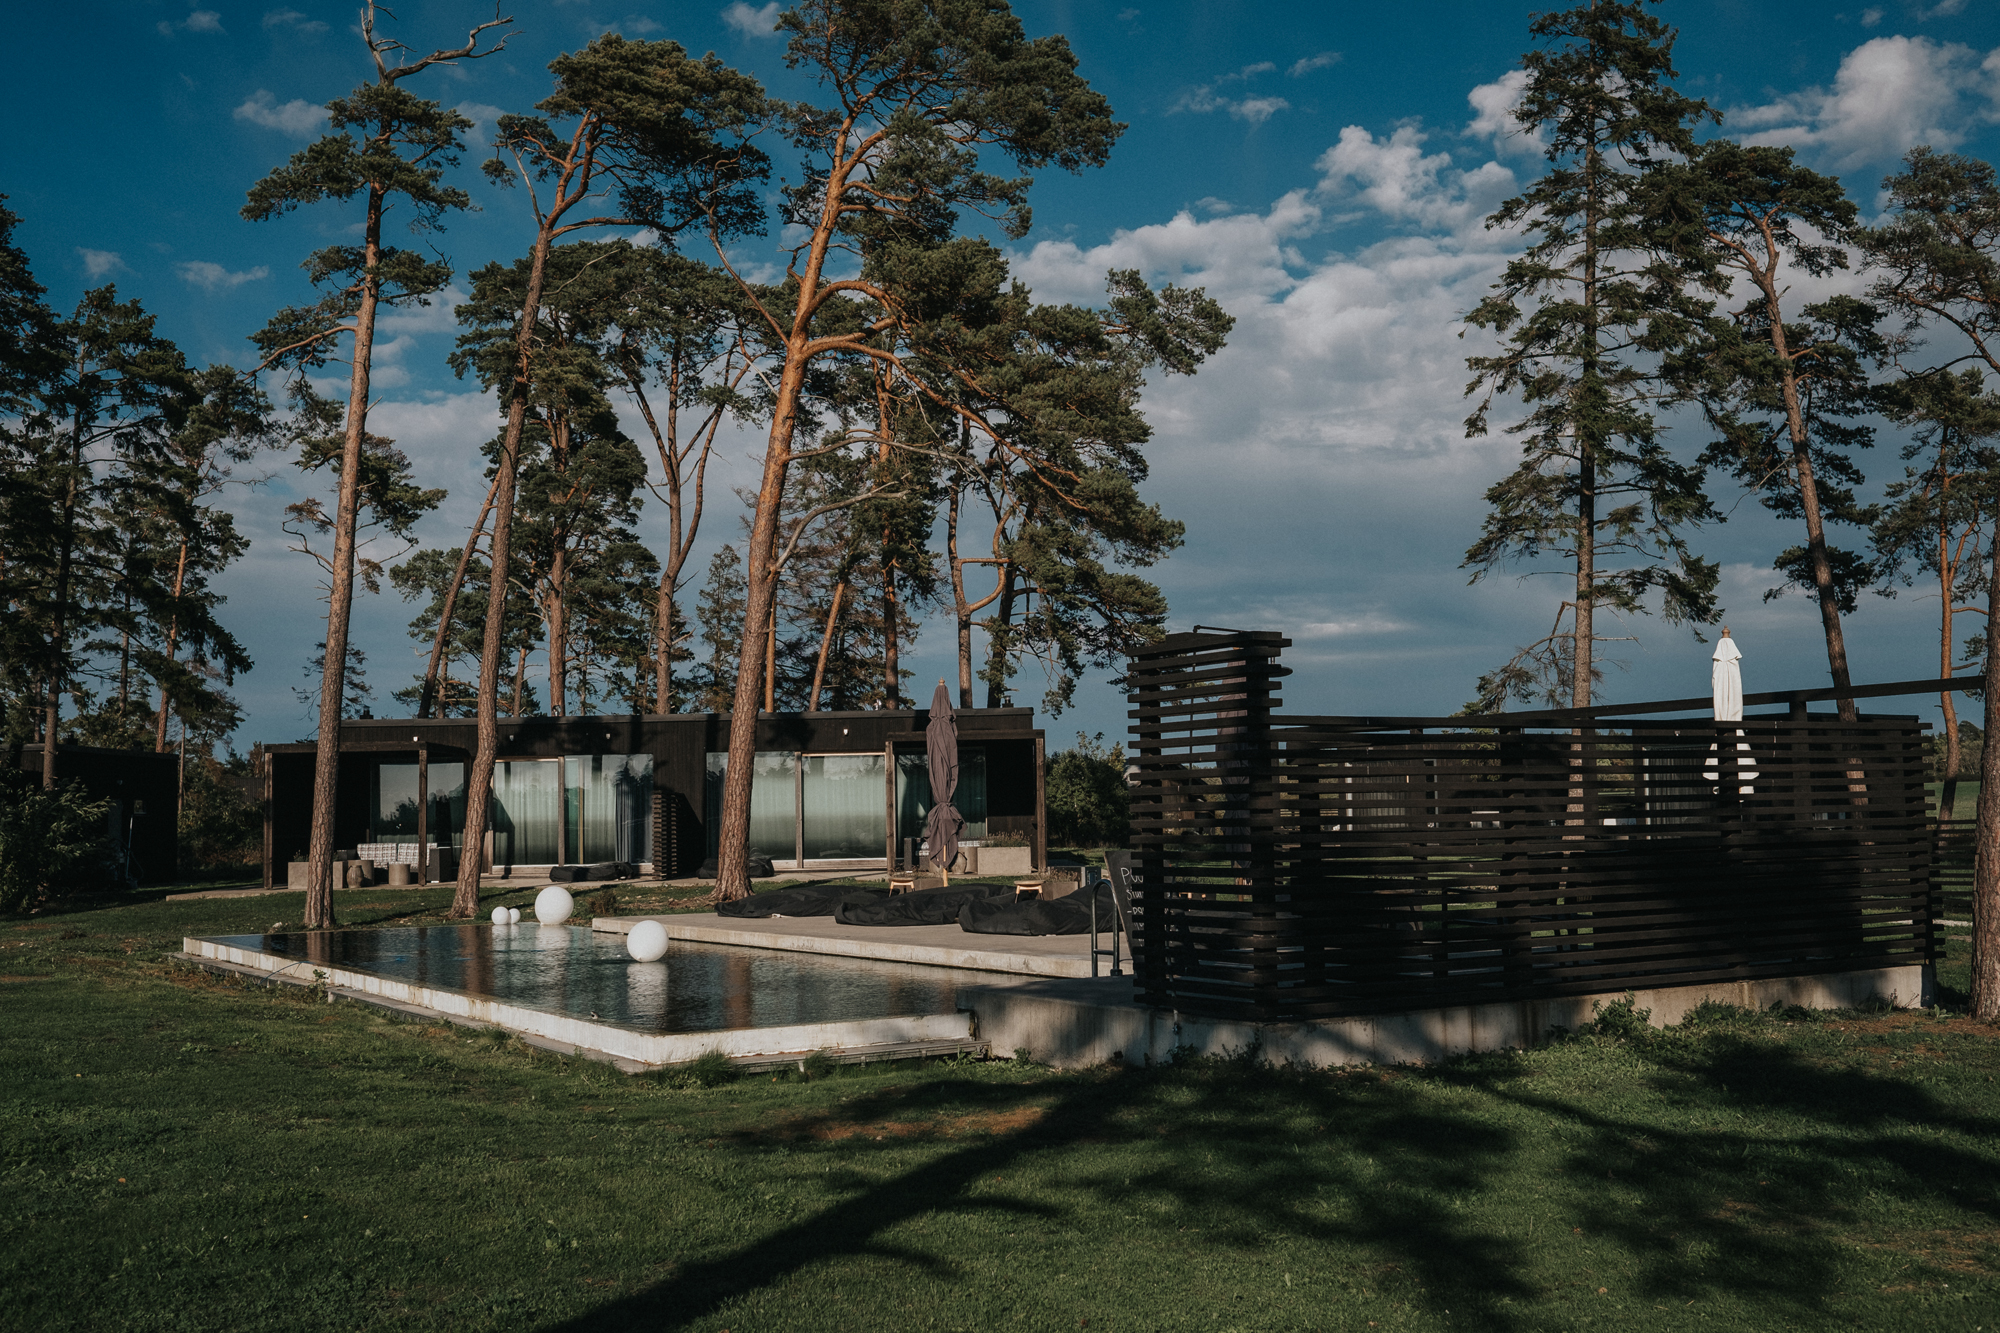 045-bröllop-djupvik-hotel-neas-fotografi.jpg